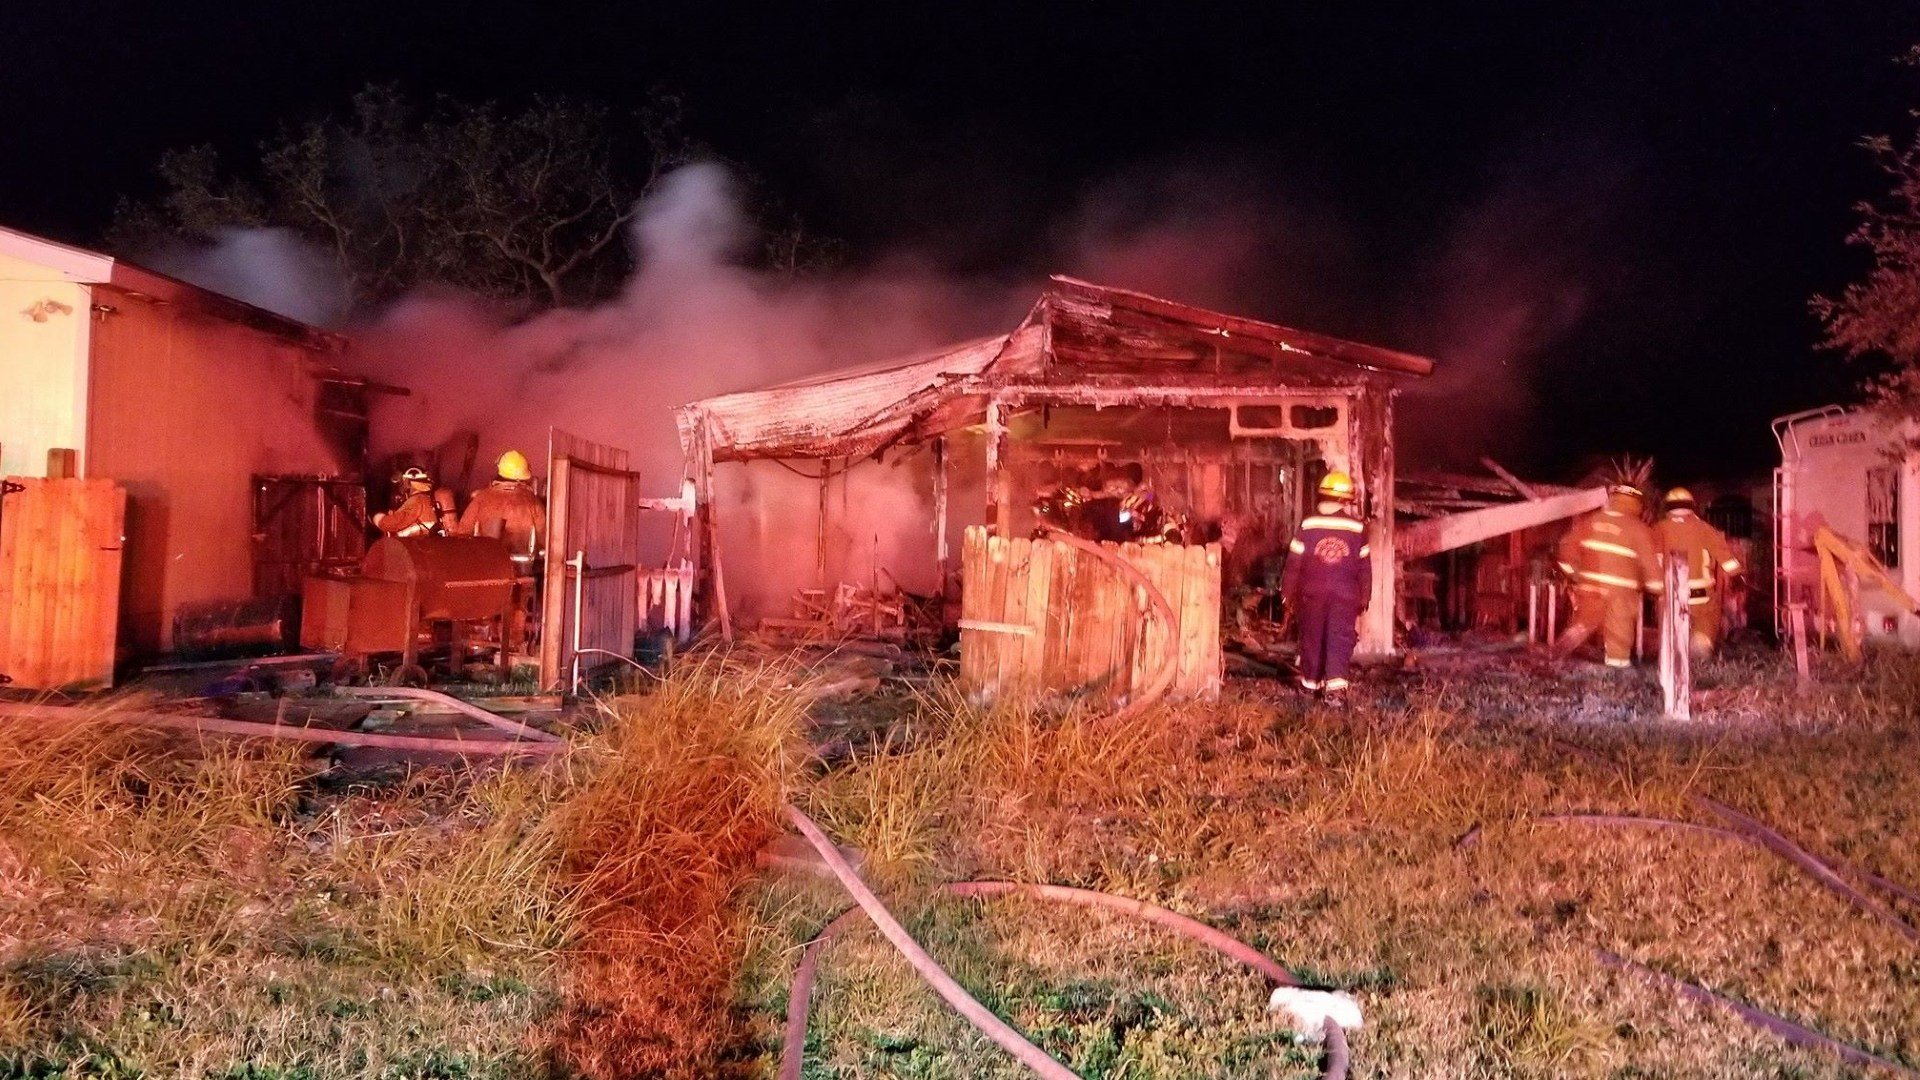 Rockport Volunteer Fire Dept. / Facebook